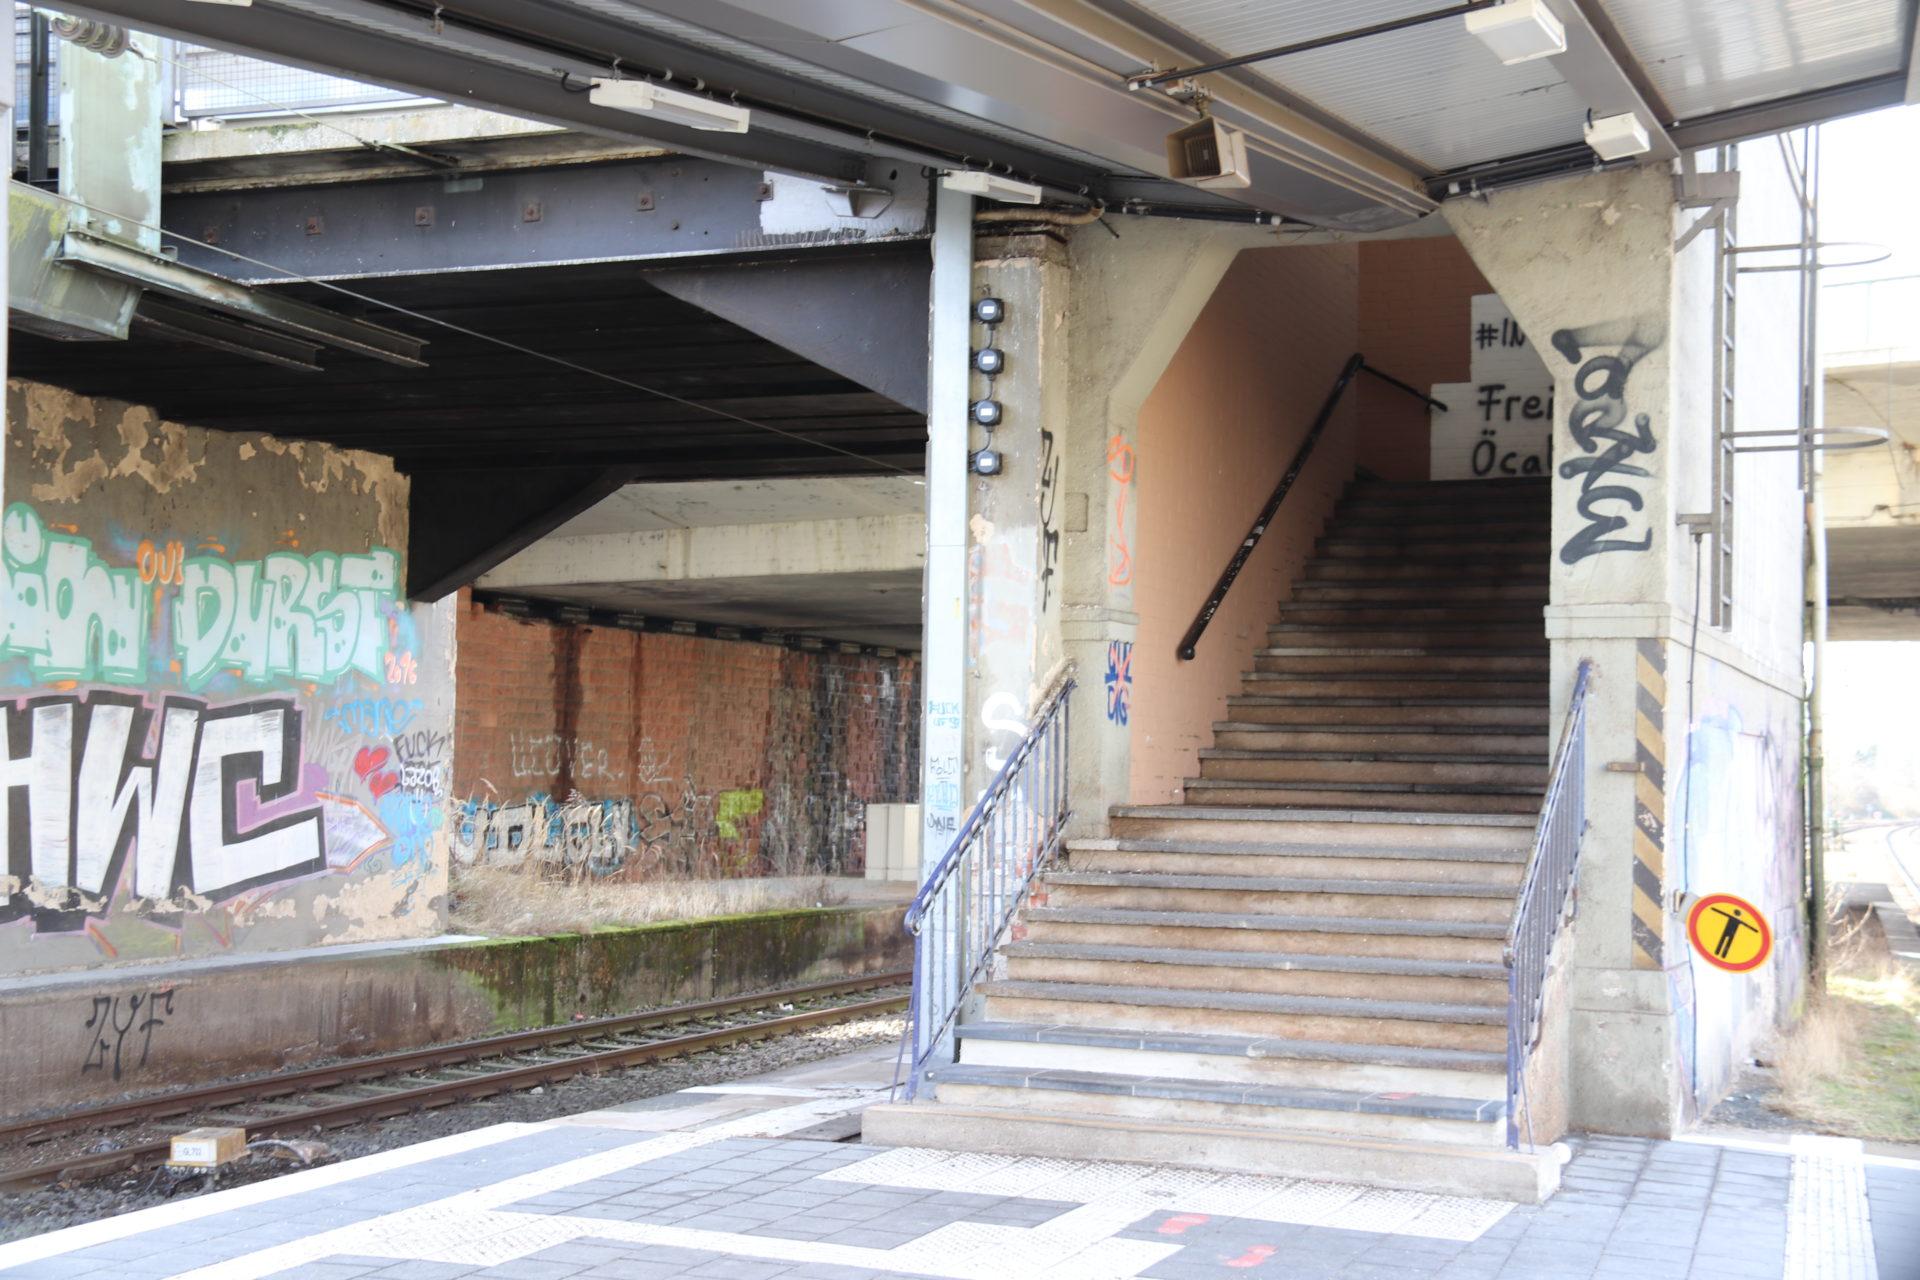 Darmstädter Nordbahnhof